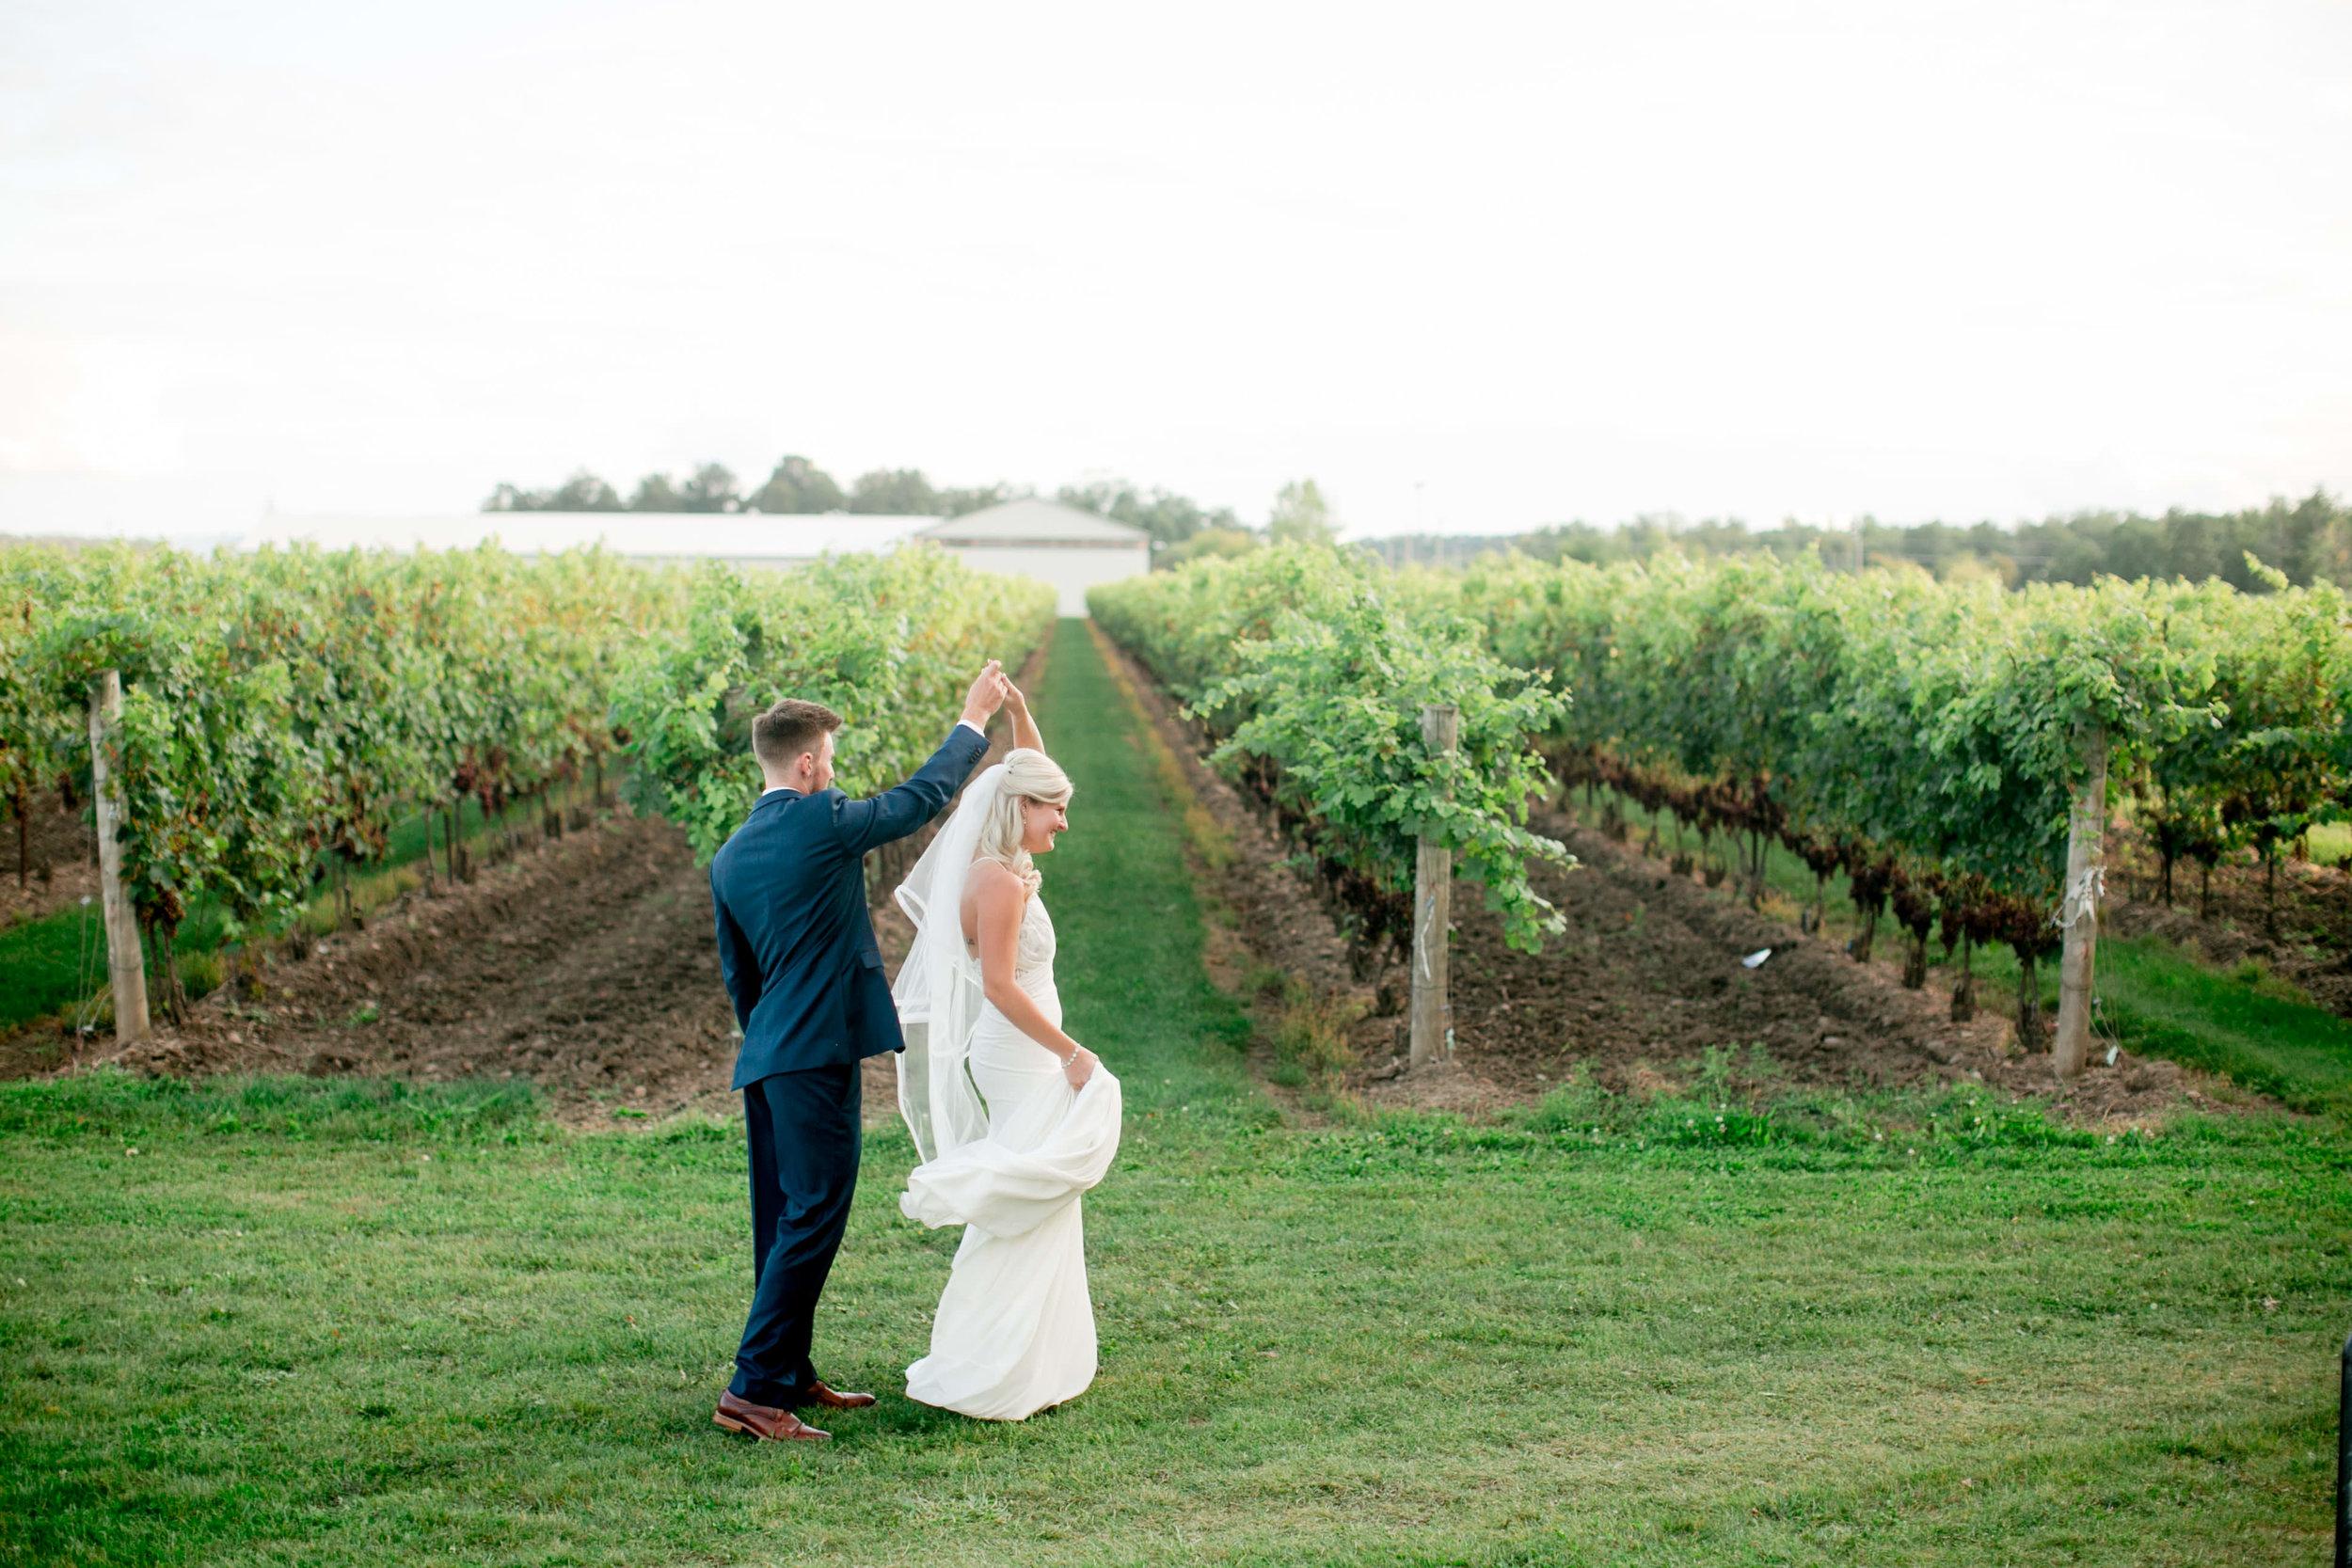 Maddy___Brandon___Daniel_Ricci_Weddings_High_Res._Finals_457.jpg